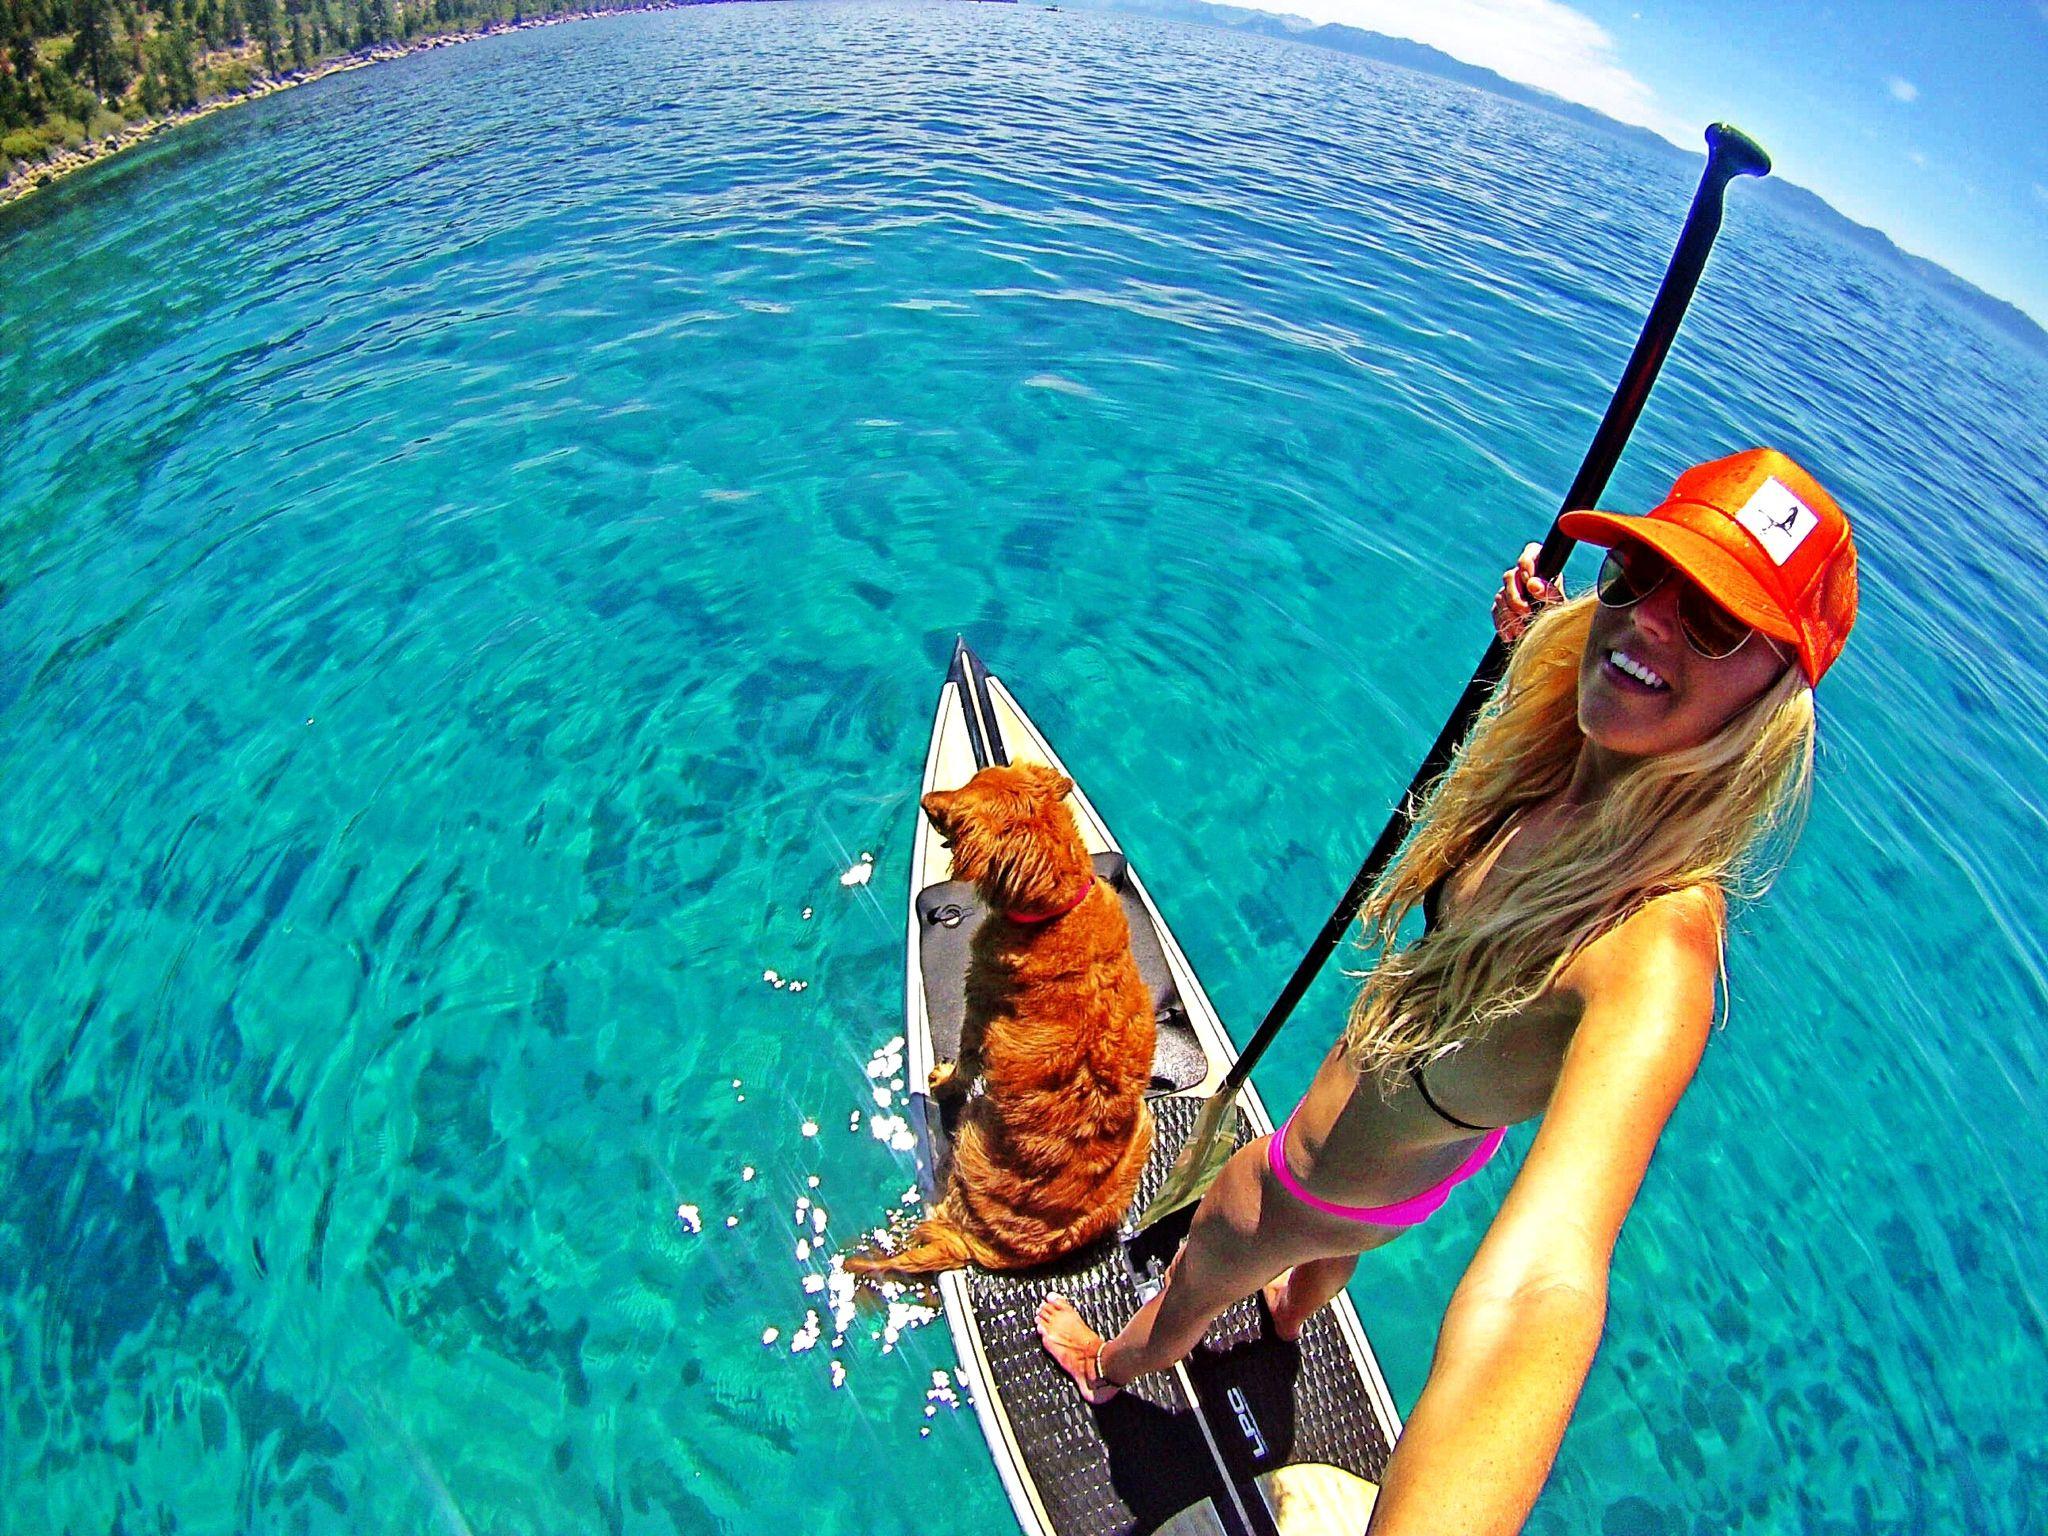 Lake tahoe circumnavigation by breeze turner captain moo